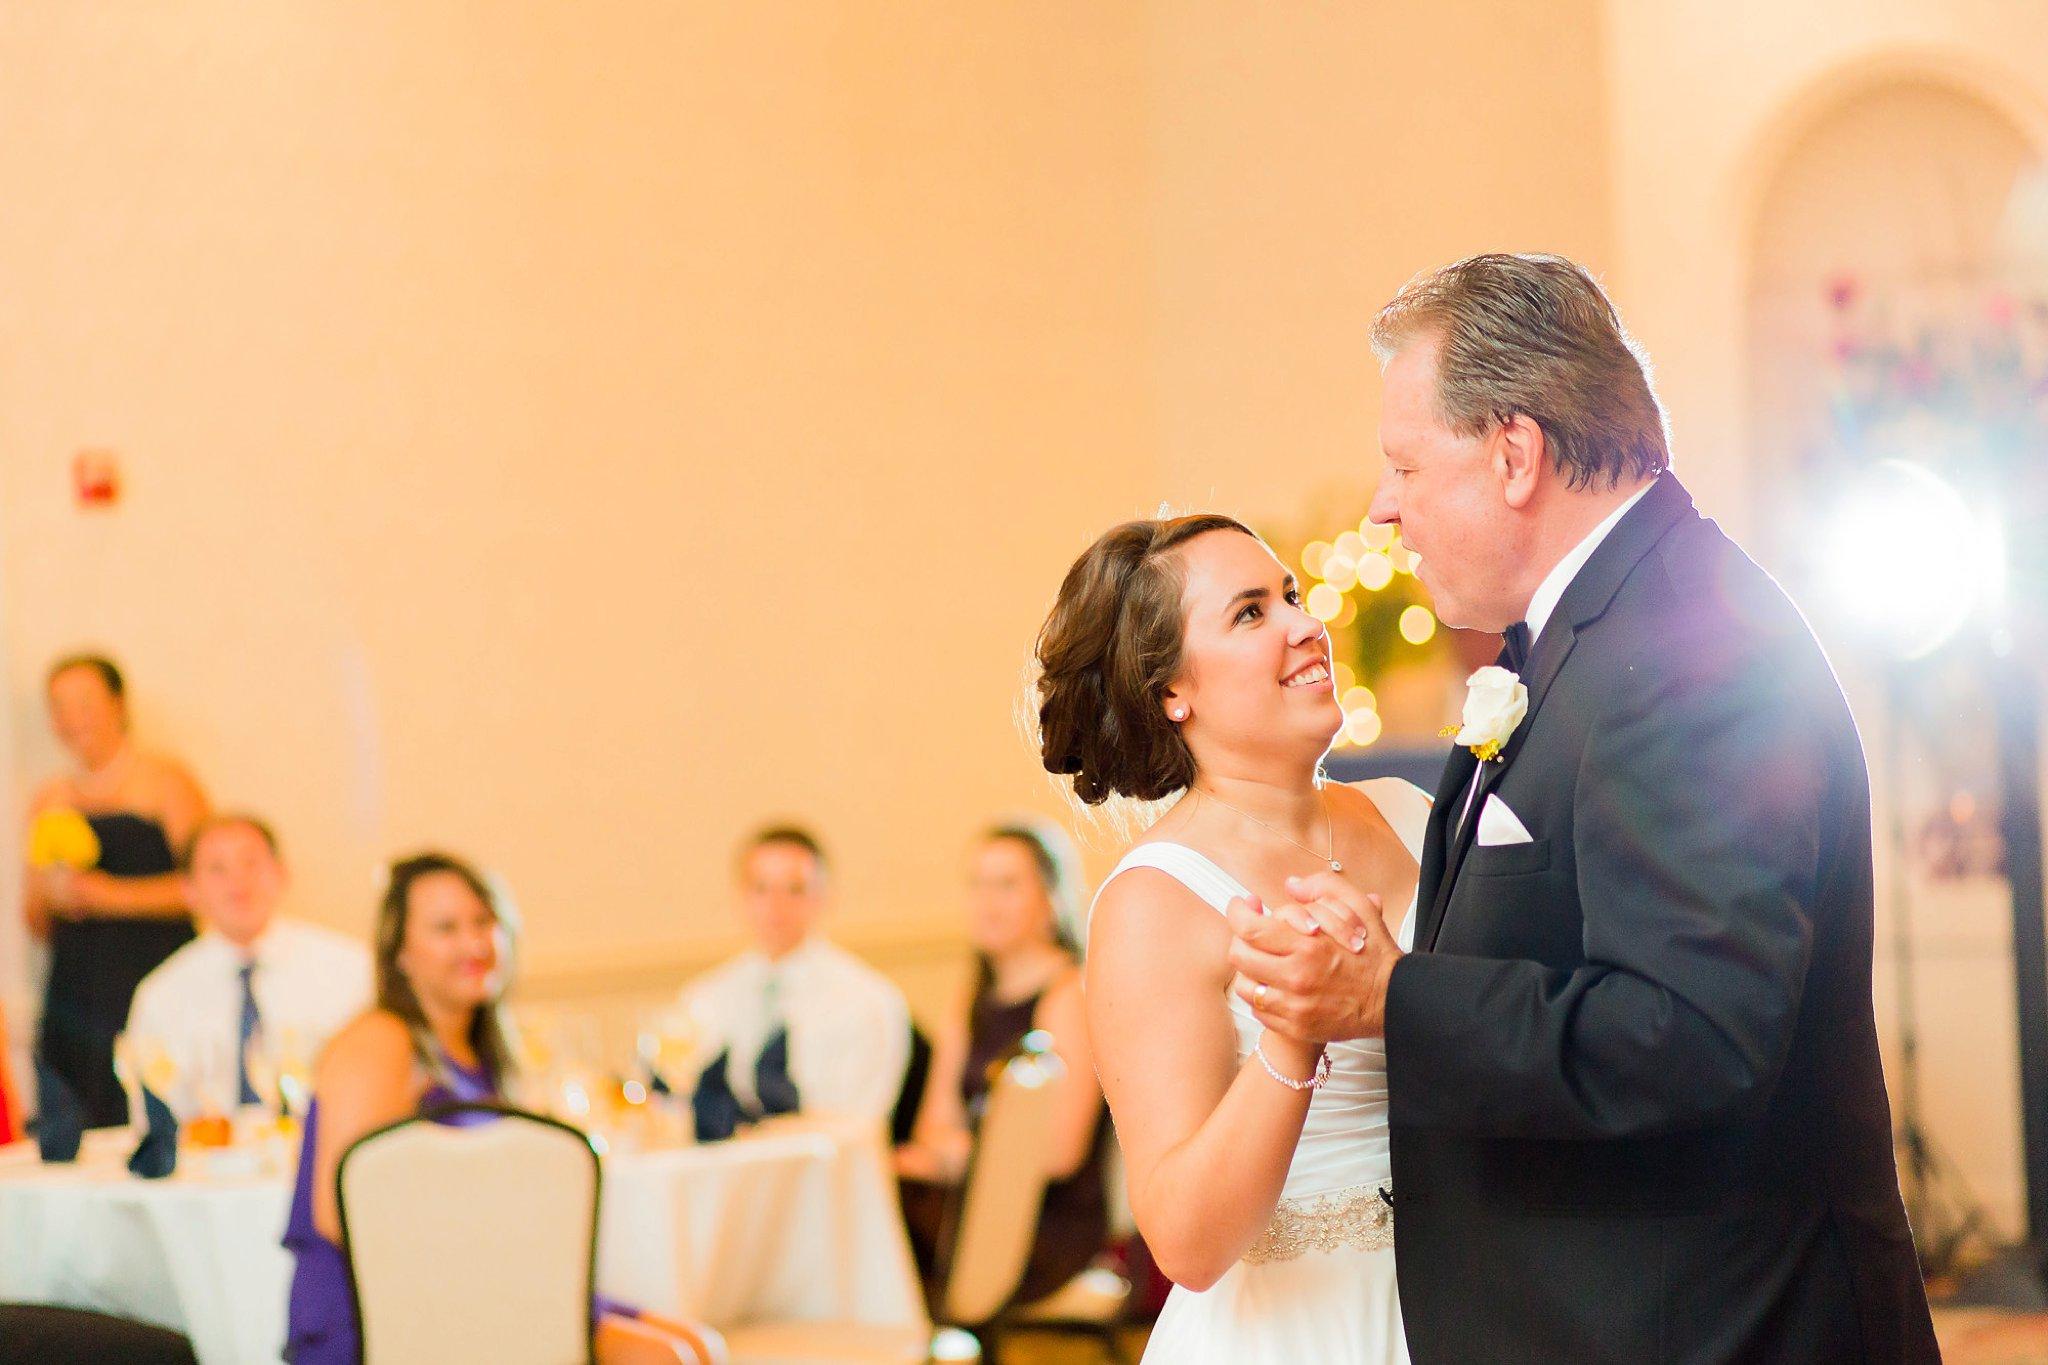 Waterford Fair Oaks Wedding Photos Northern Virginia Wedding Photographer Megan Kelsey Photography Lindsay & Joey-159.jpg